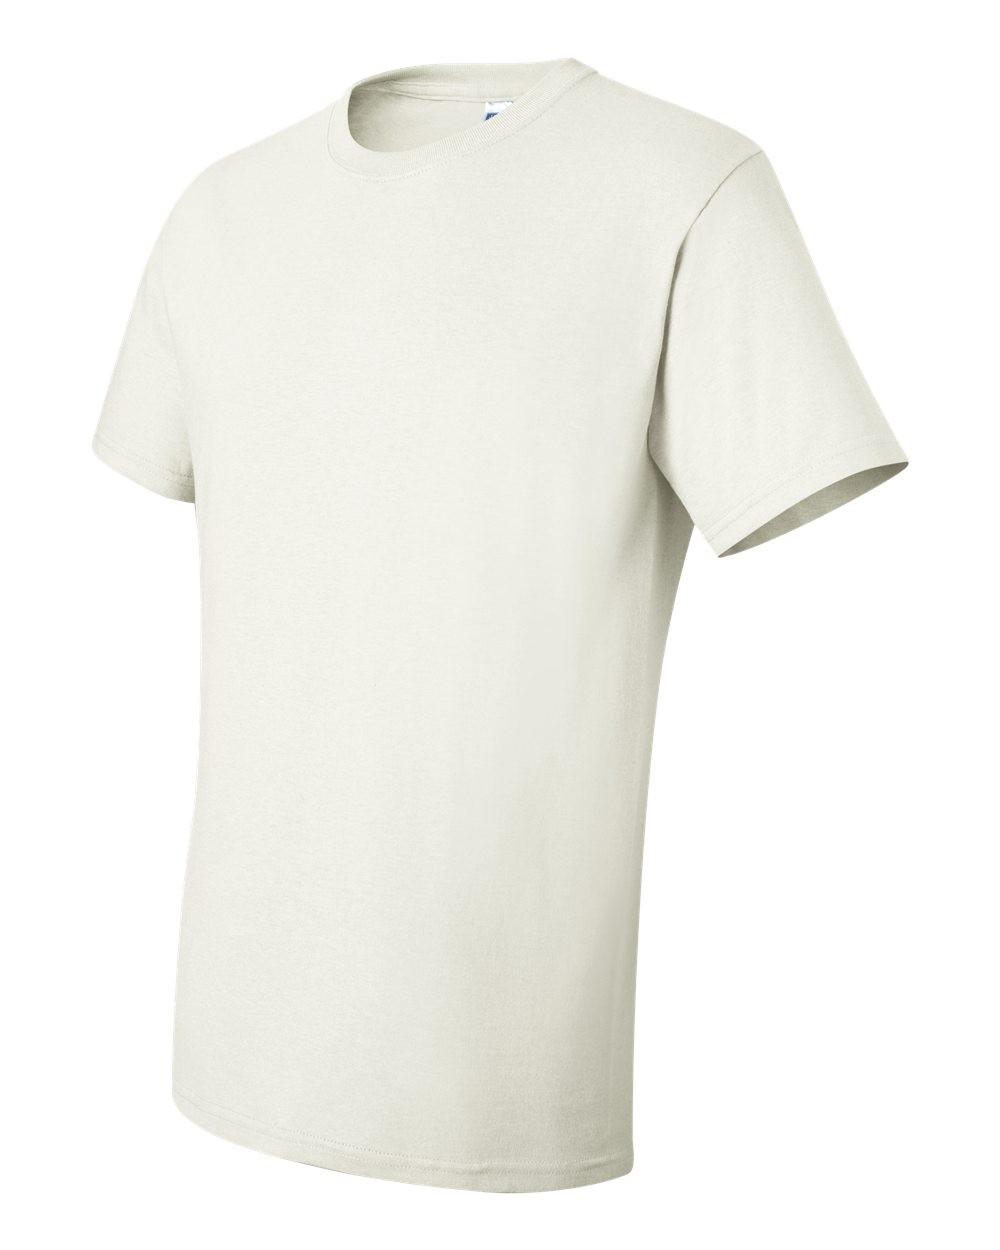 SHS-HARTSDALE Gym T-Shirt w/ Logo